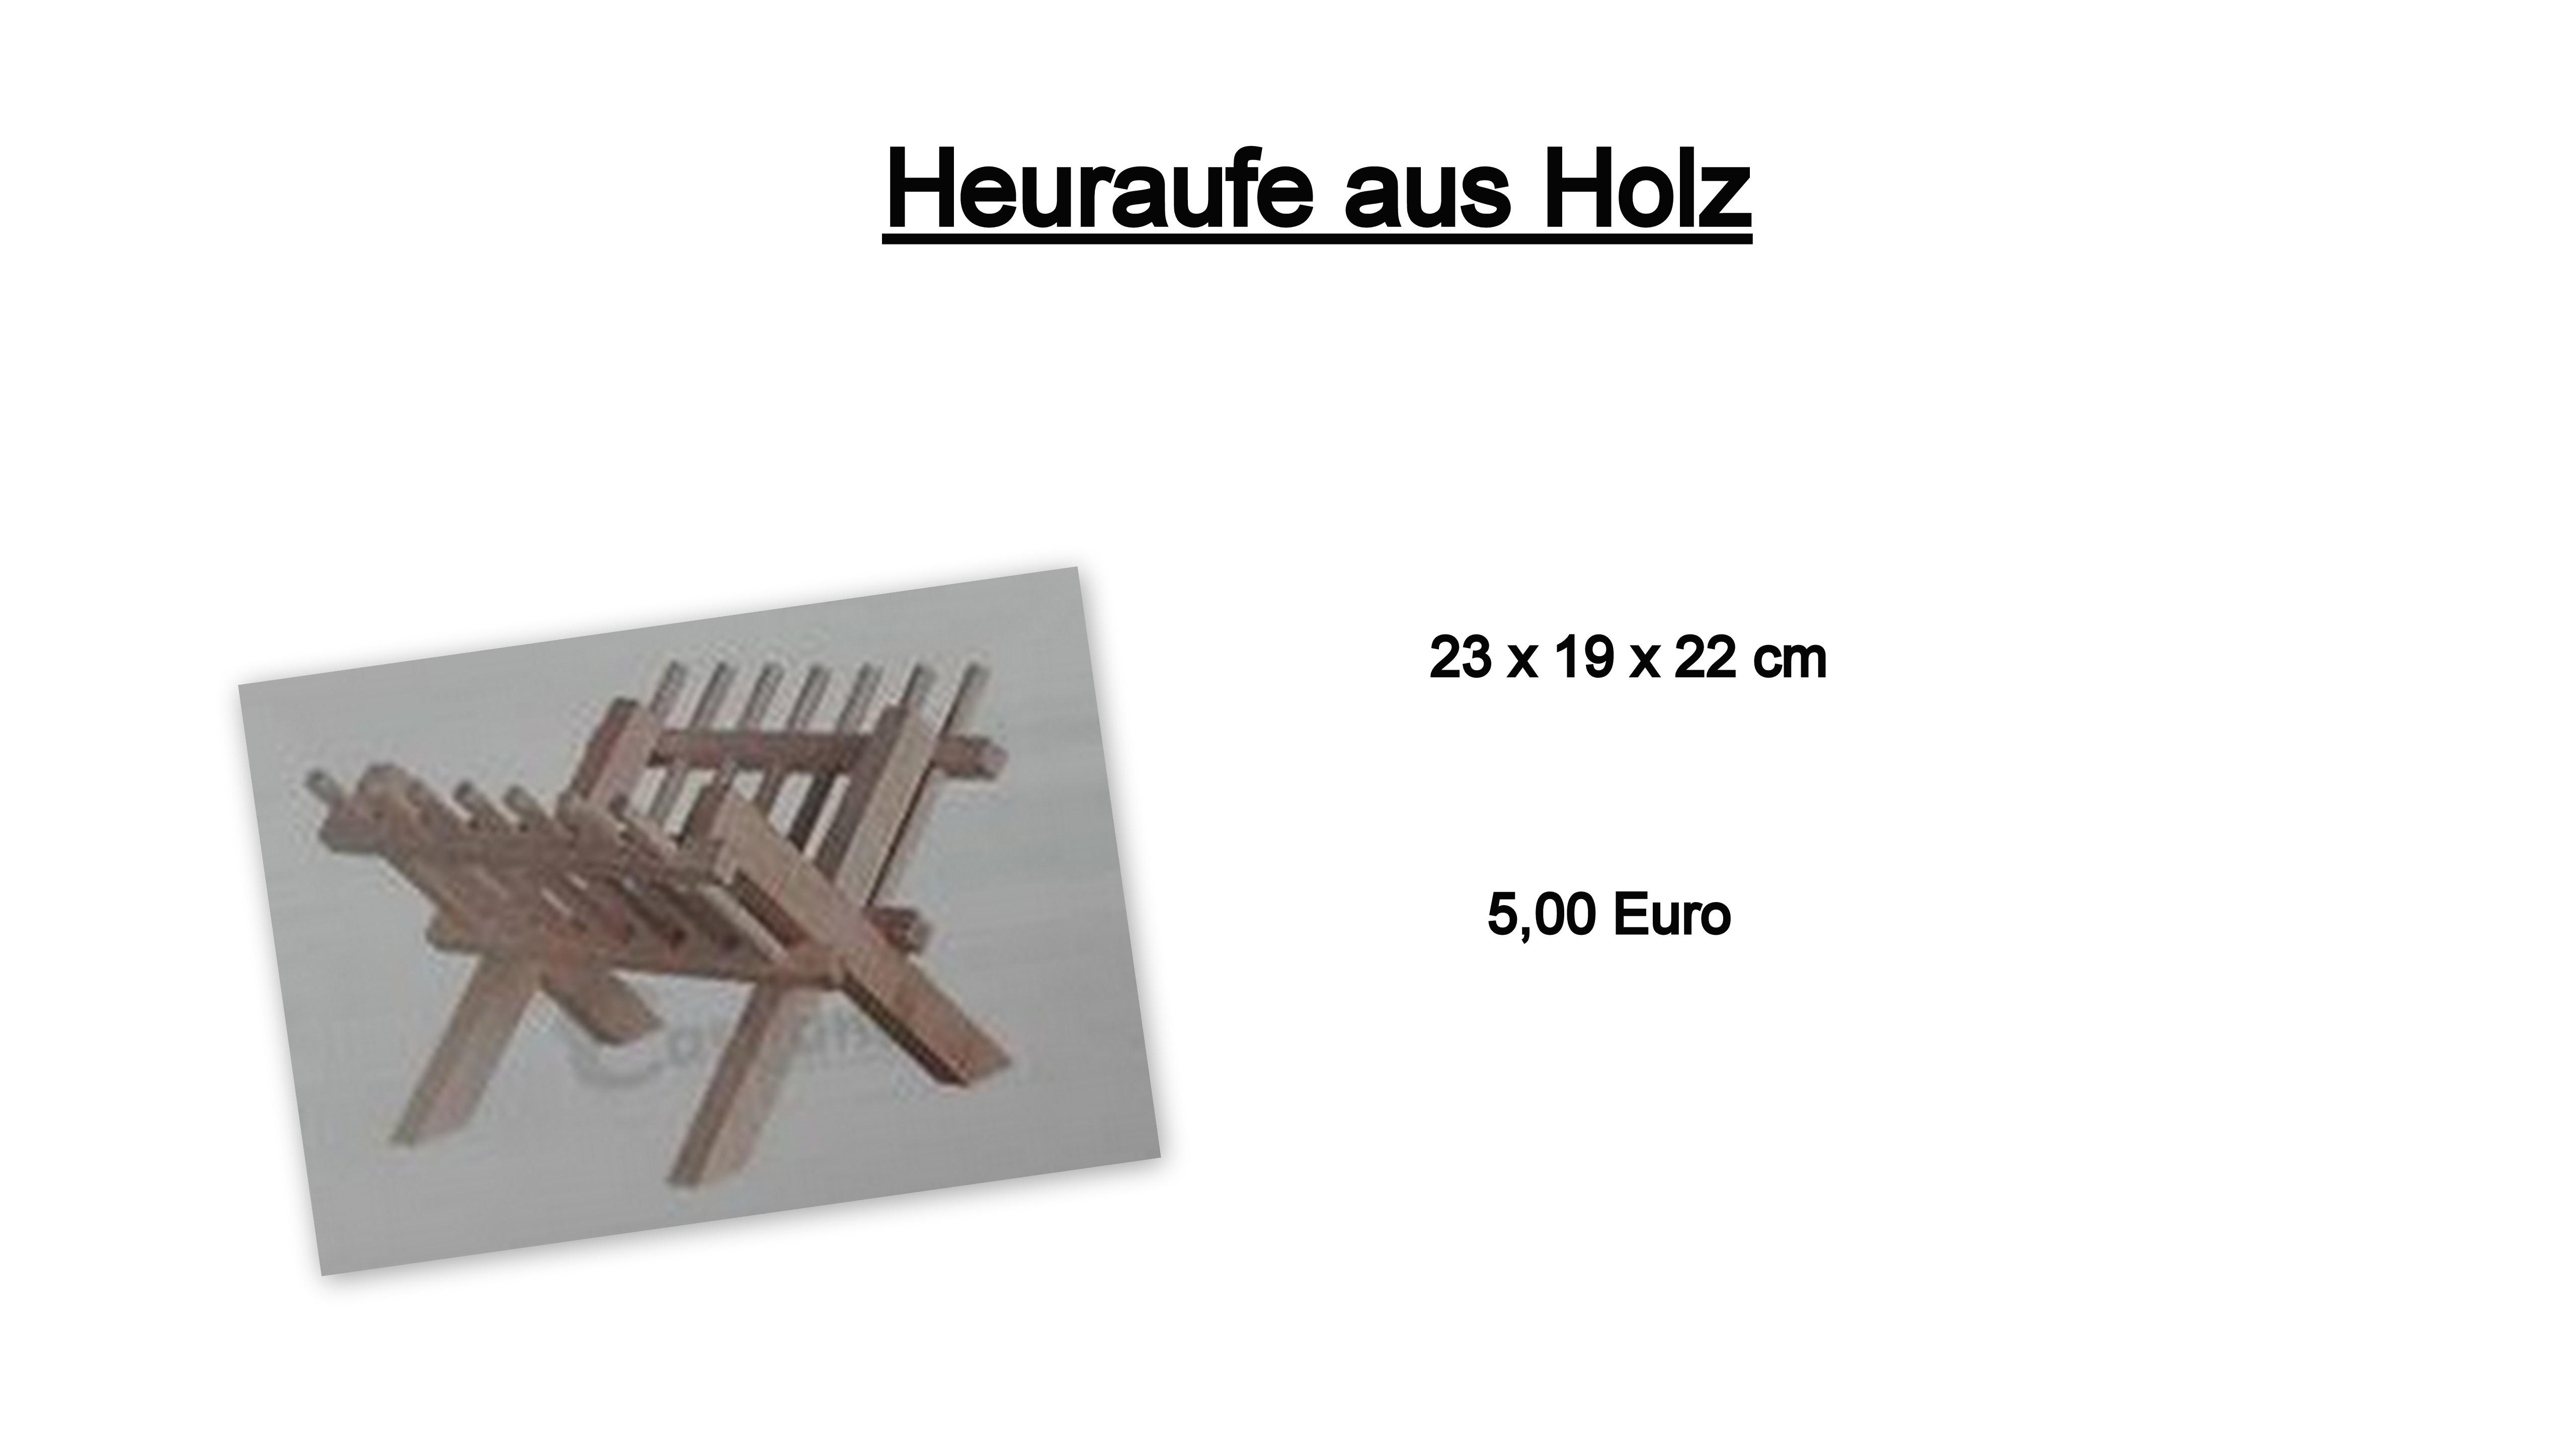 Heuraufe